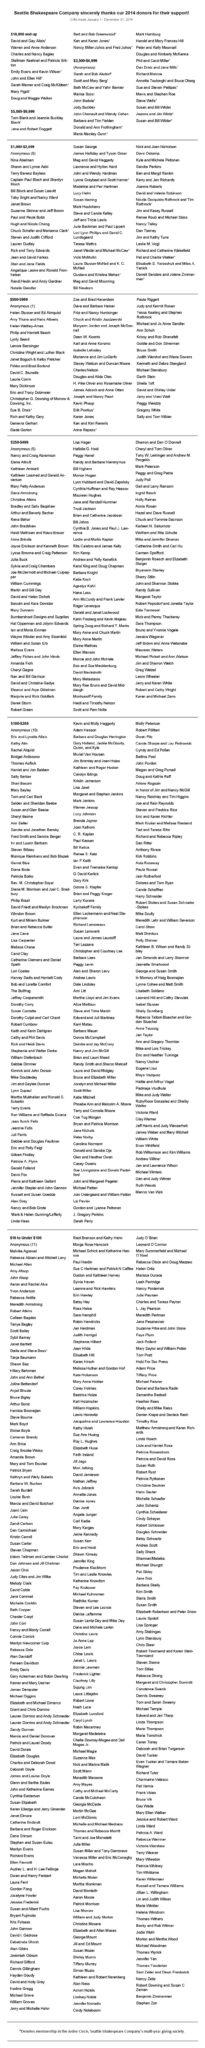 Online Donor List_updated